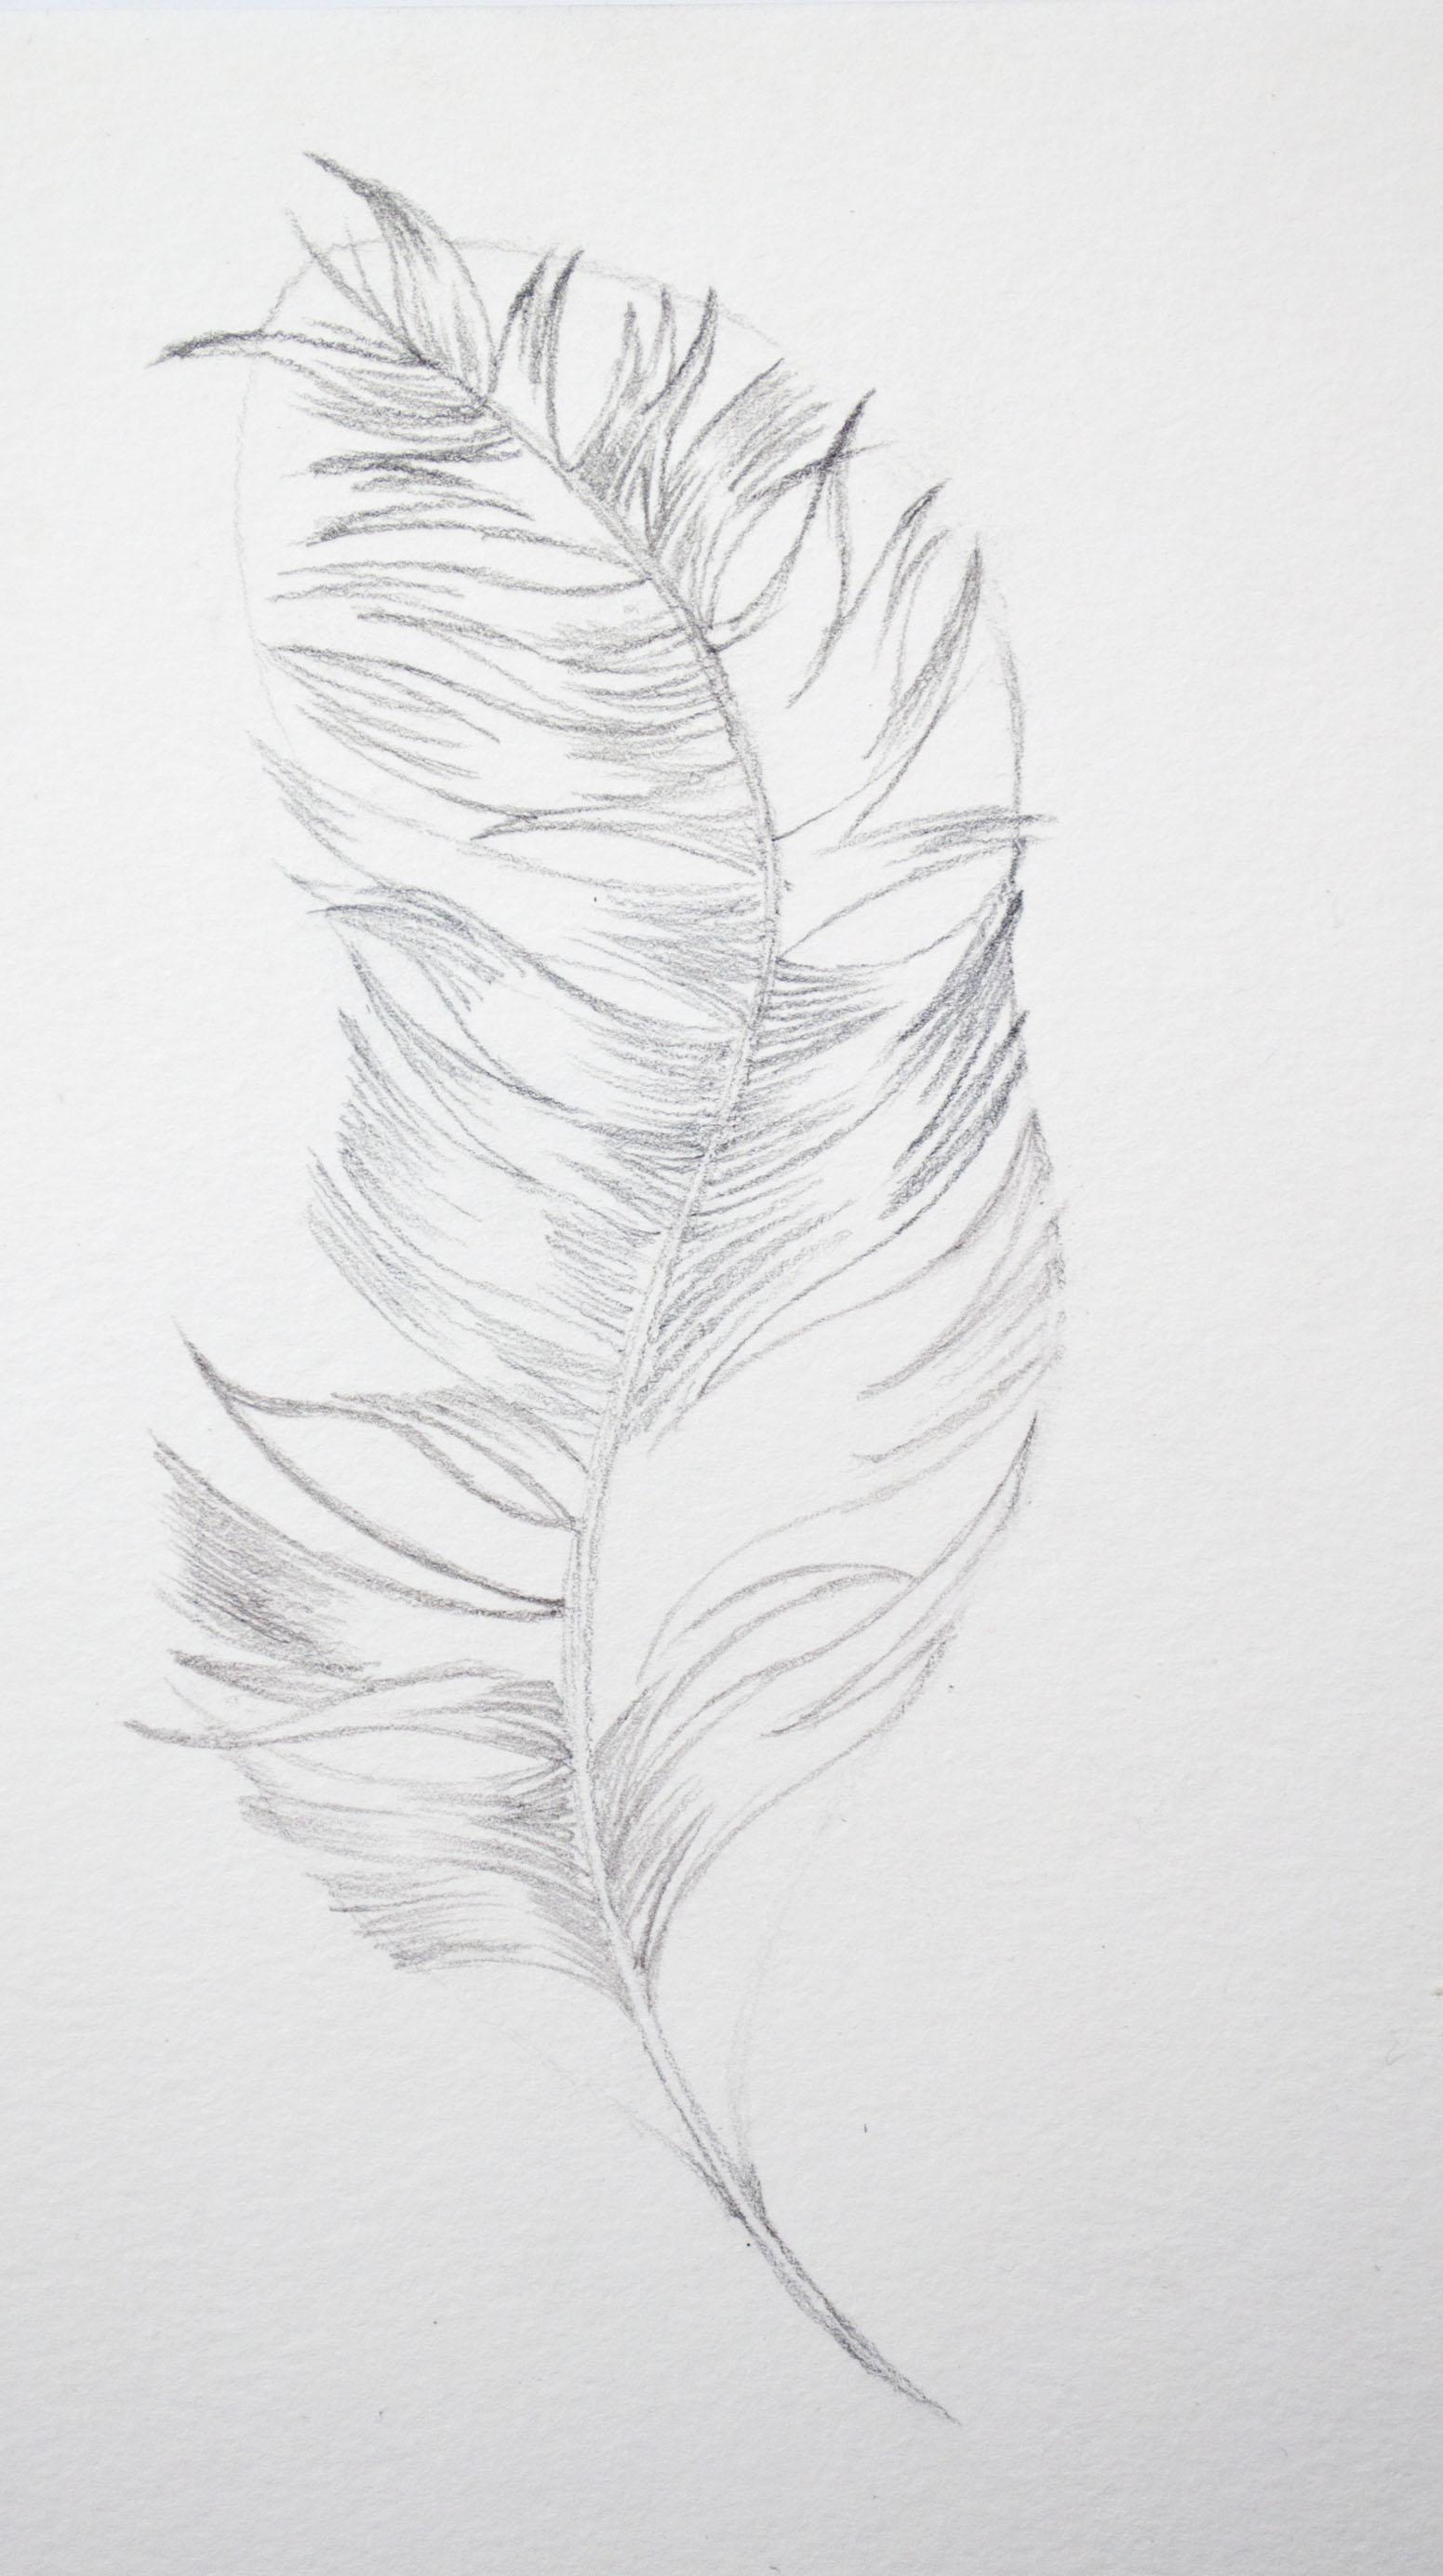 Caran Dache Feather Image 5.jpg